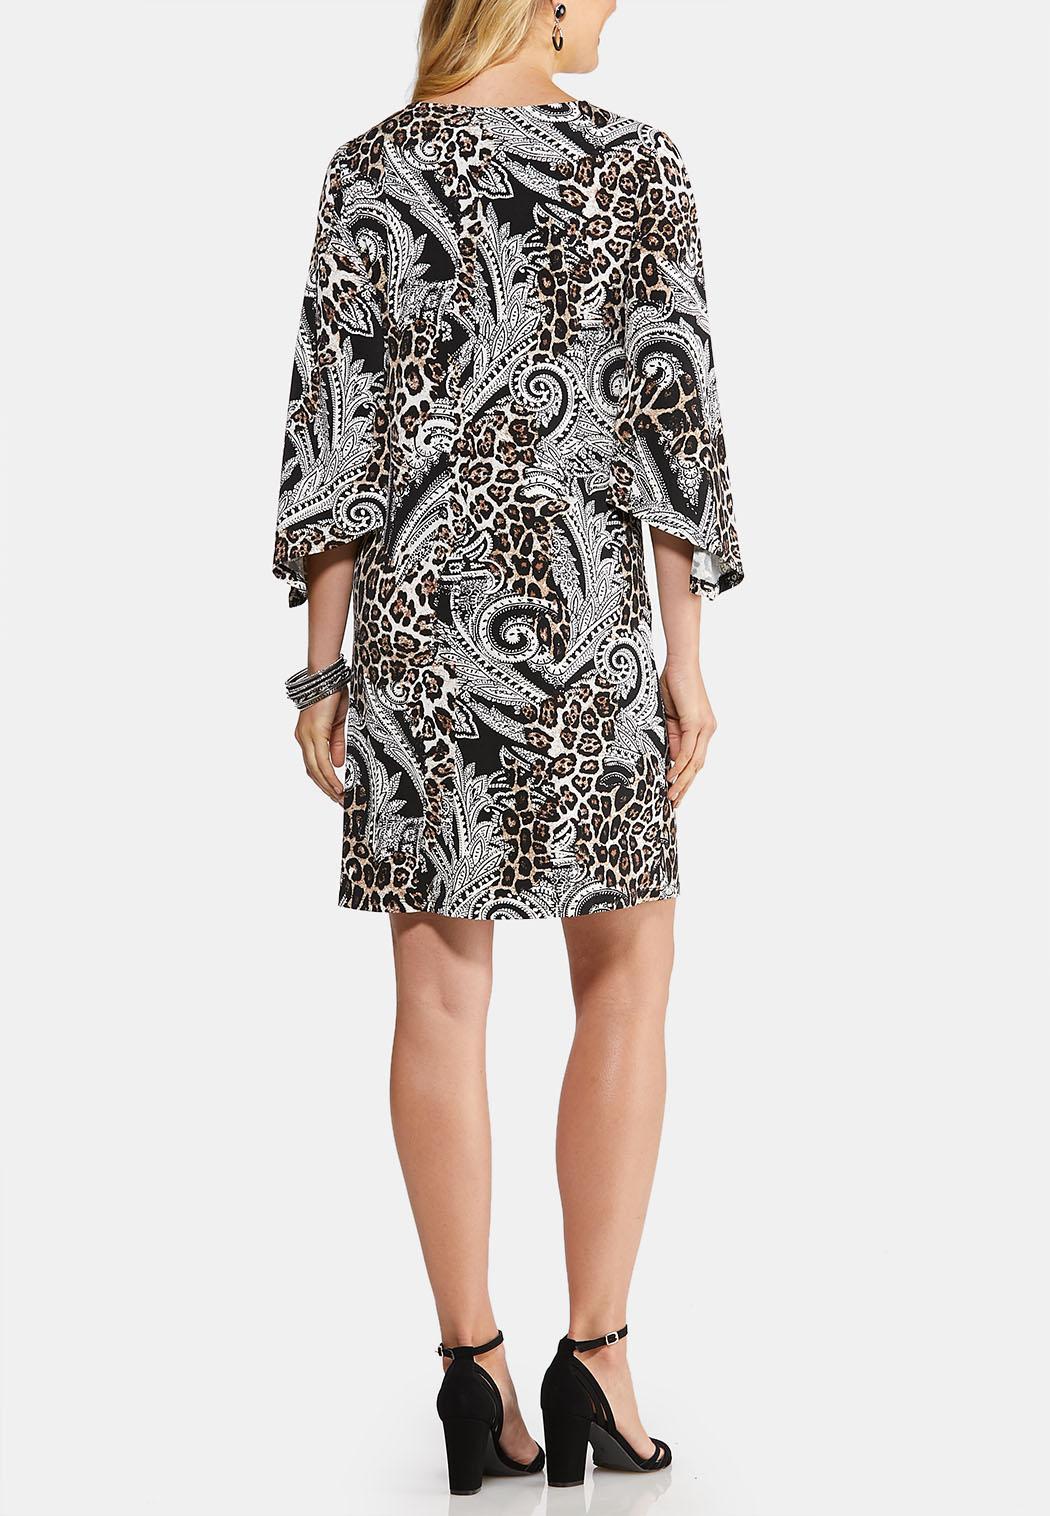 Textured Animal Paisley Dress (Item #43917944)